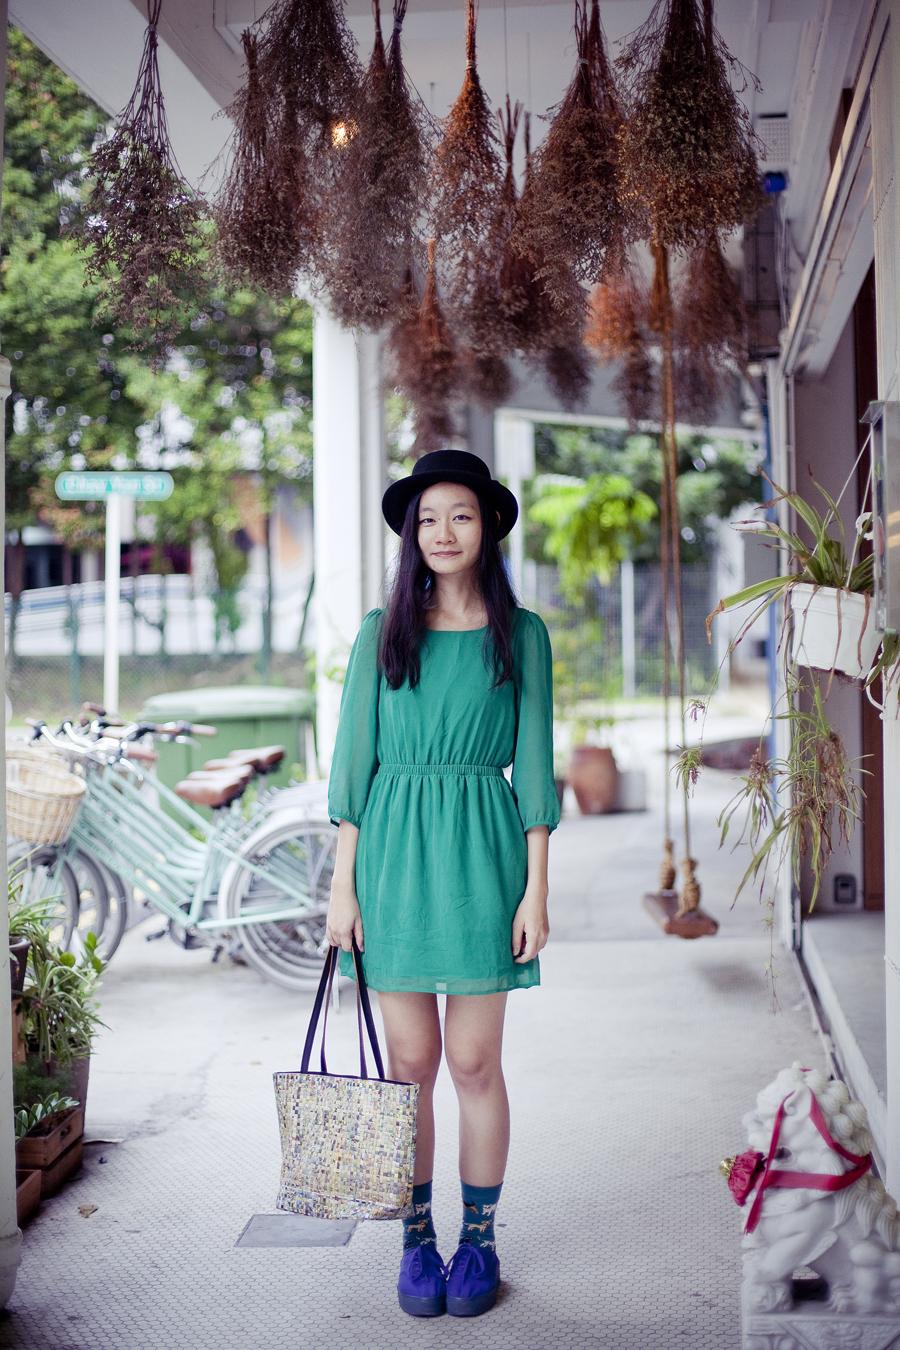 Outfit details: Forever 21 green chiffon dress, black Taobao hat, teal Taobao dog pattern socks, blue H&M platform shoes.